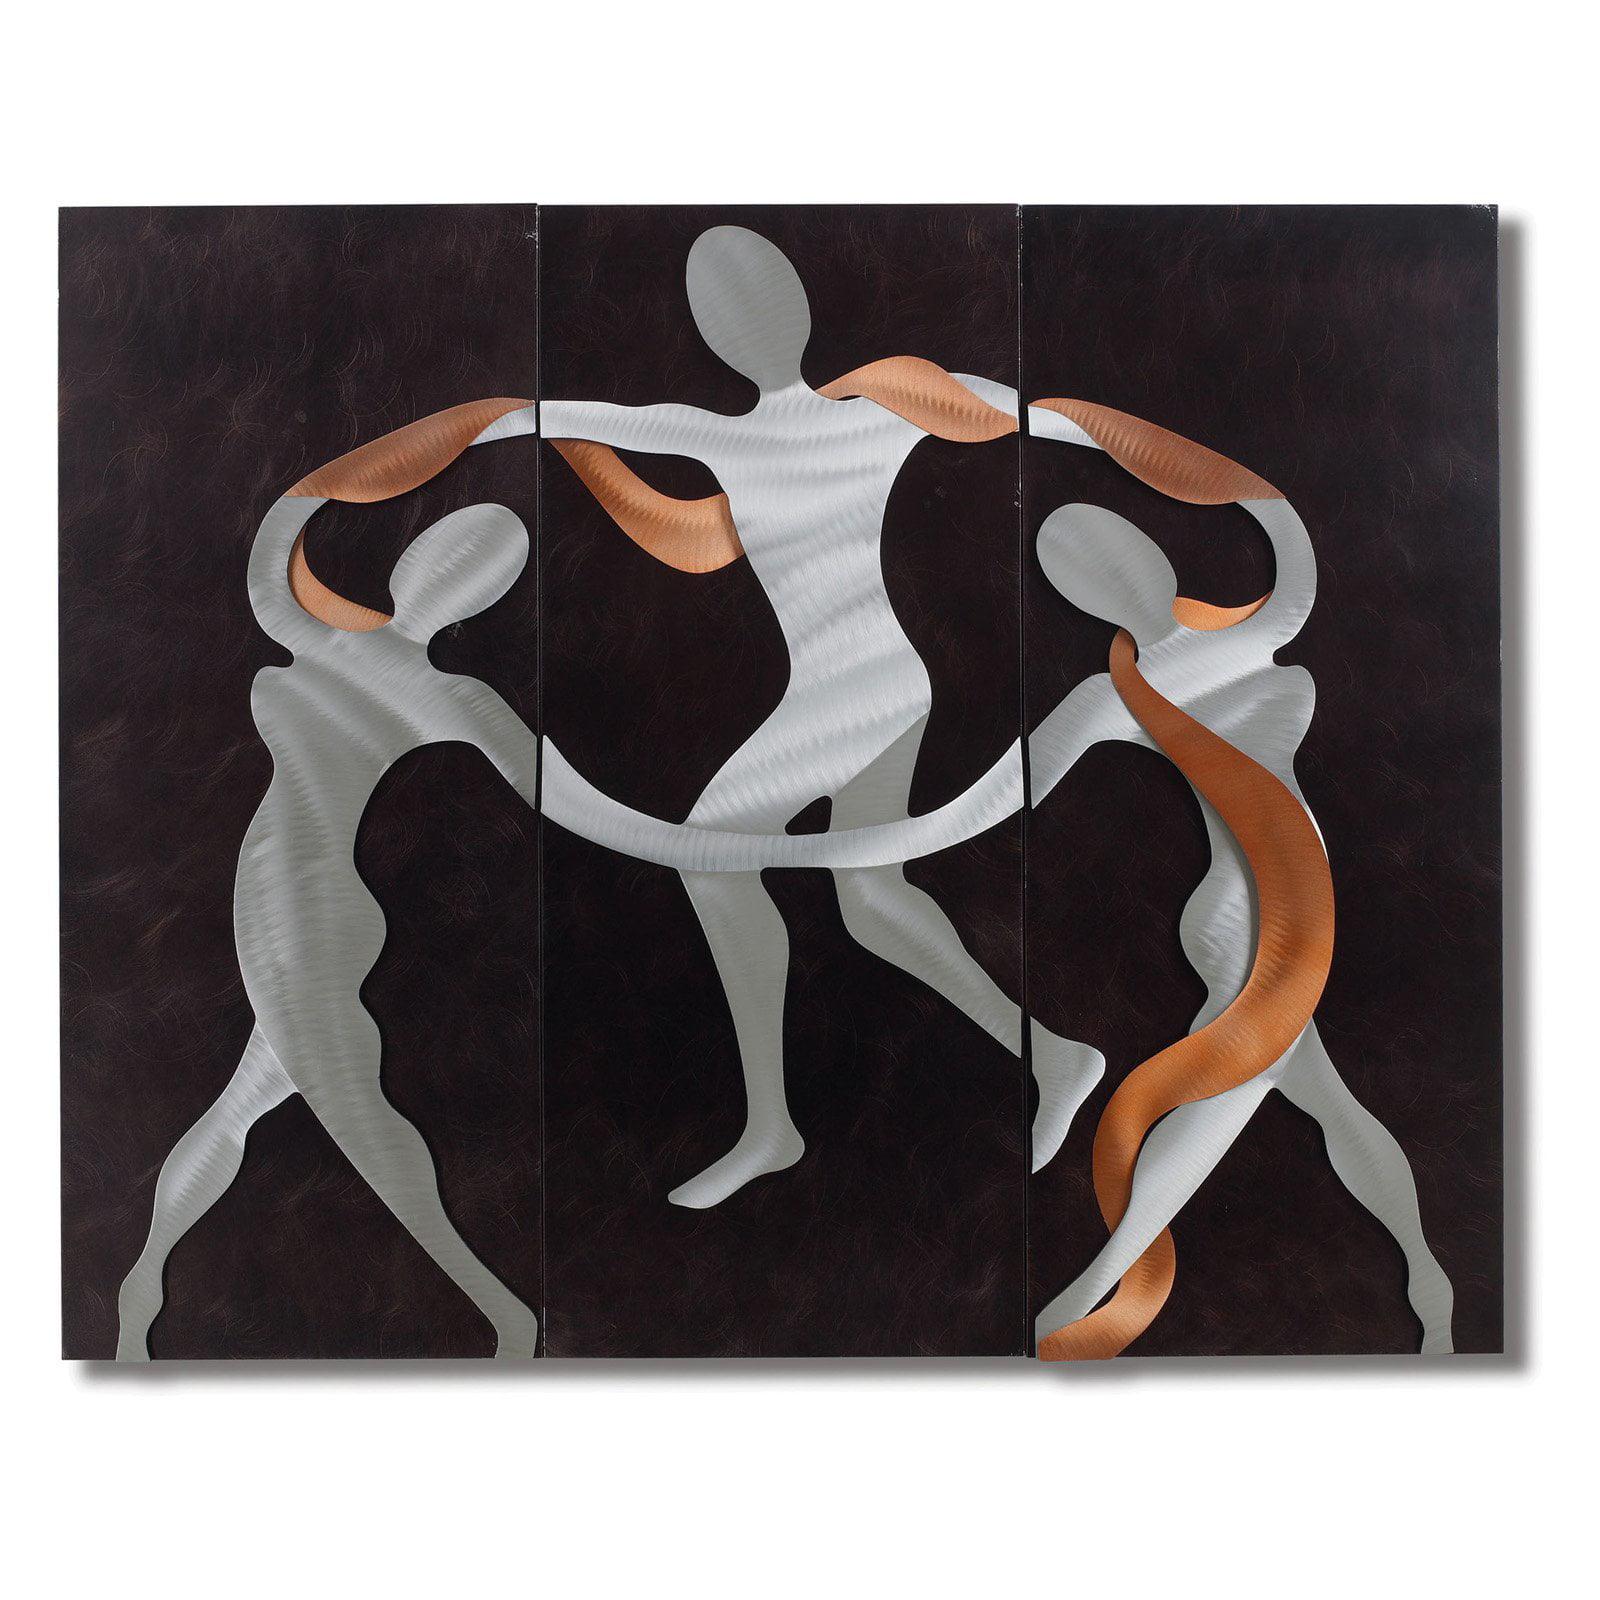 Nova Scarf Dance Metal Wall Art - 54W x 42H in.